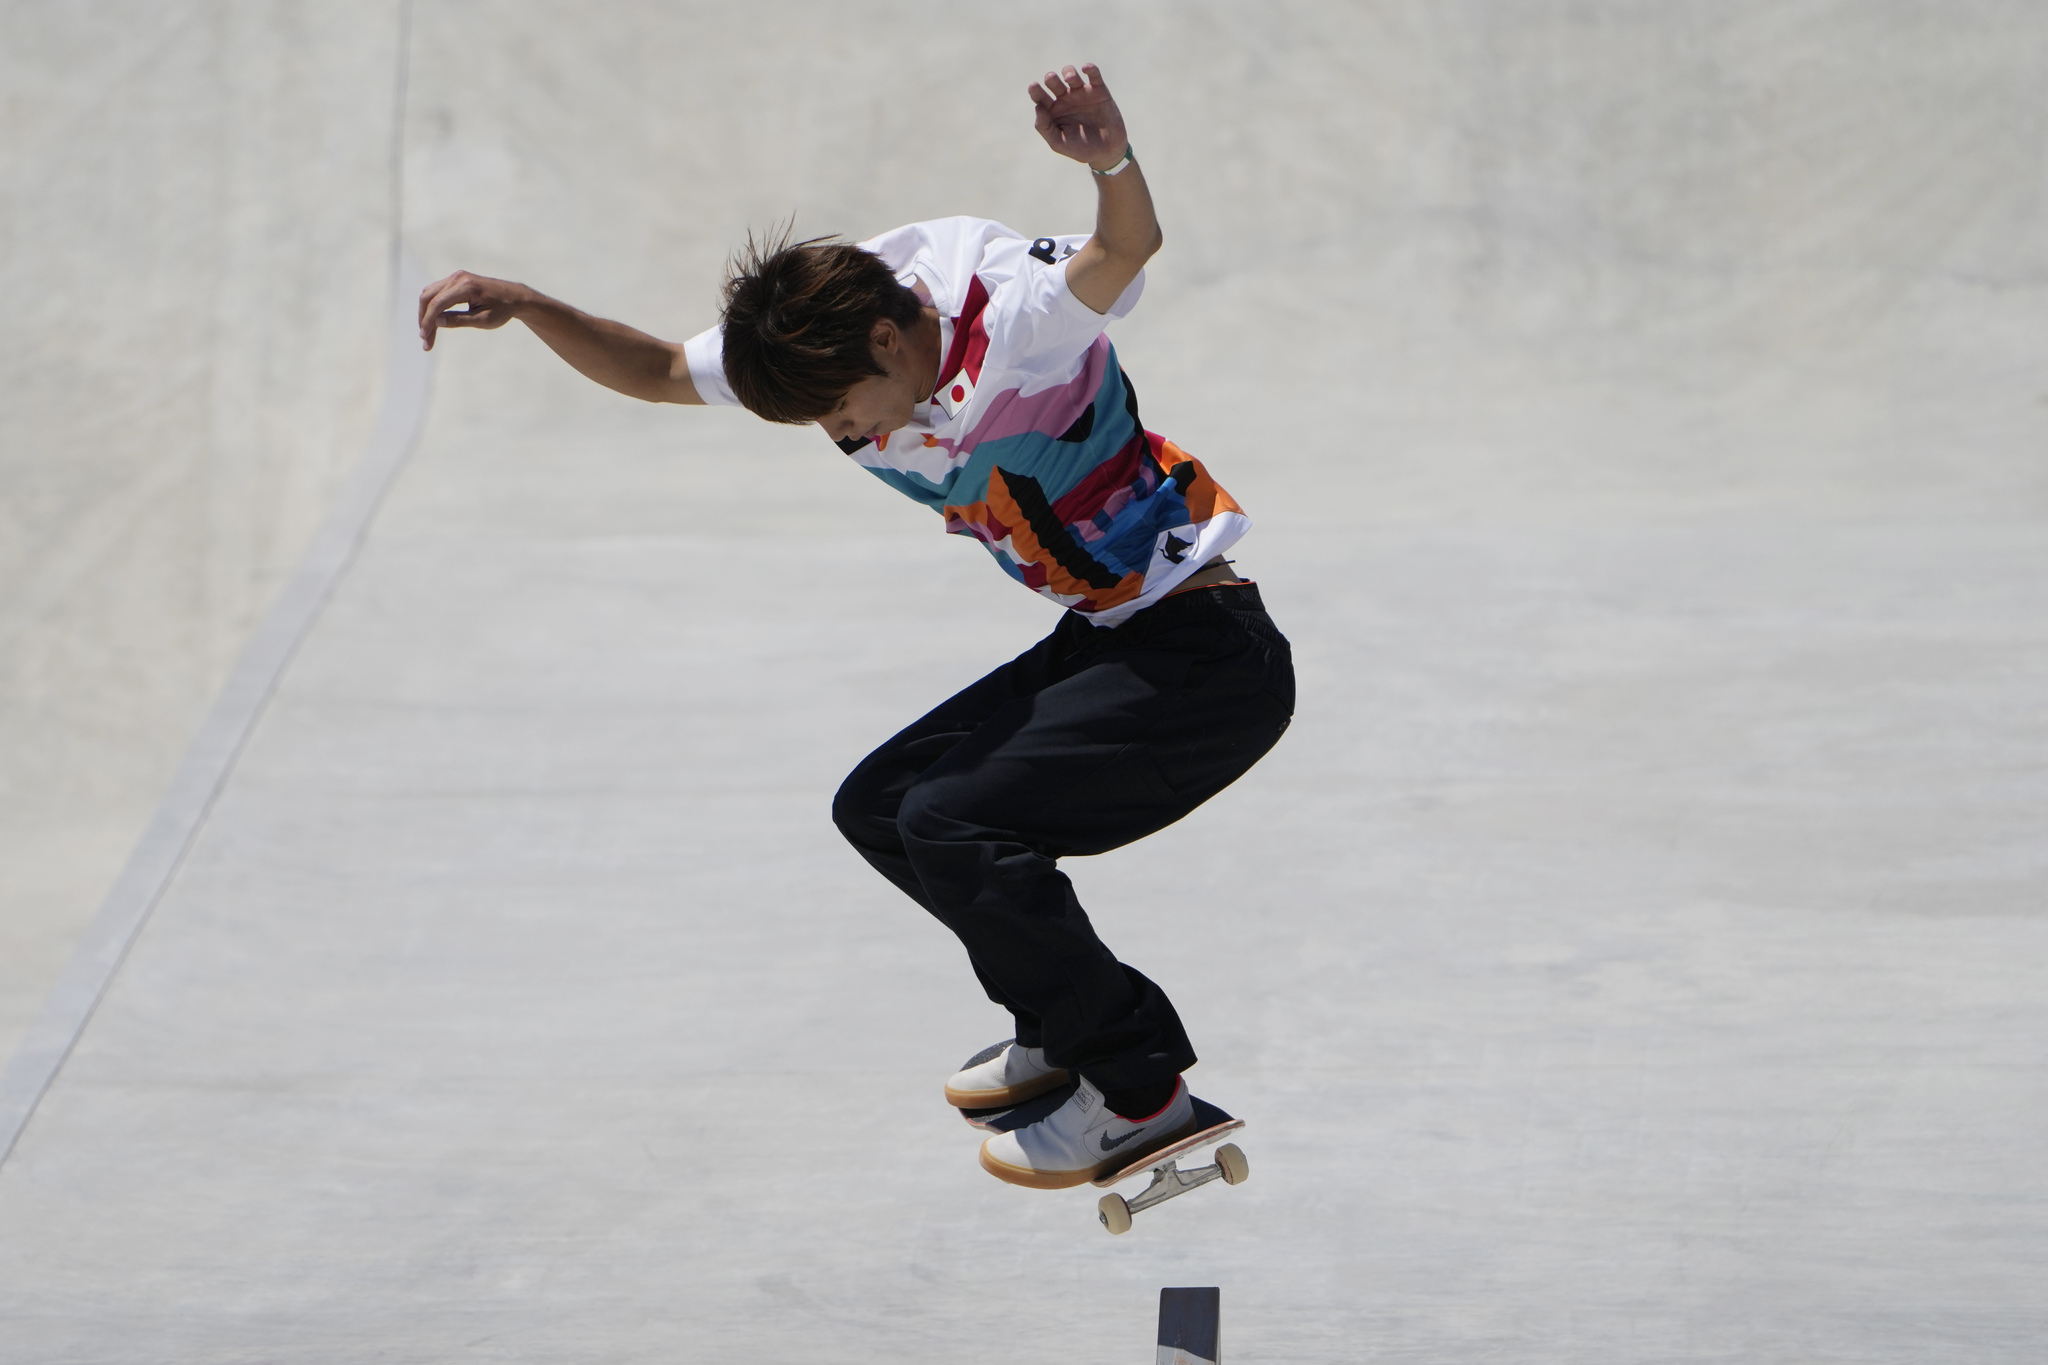 Yuto Horigome